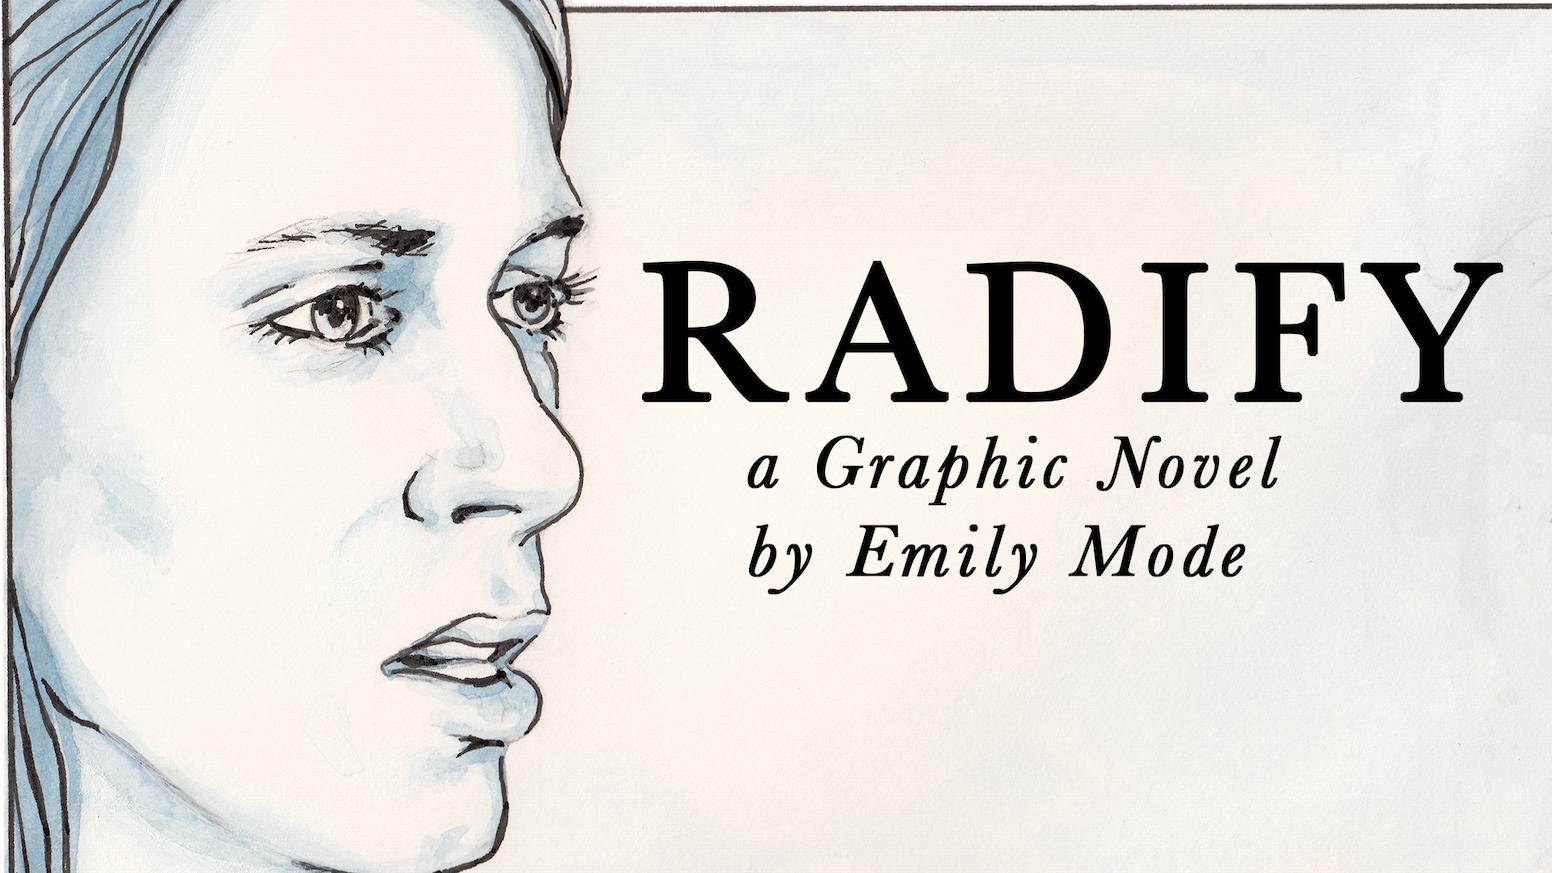 RADIFY the Graphic Novel